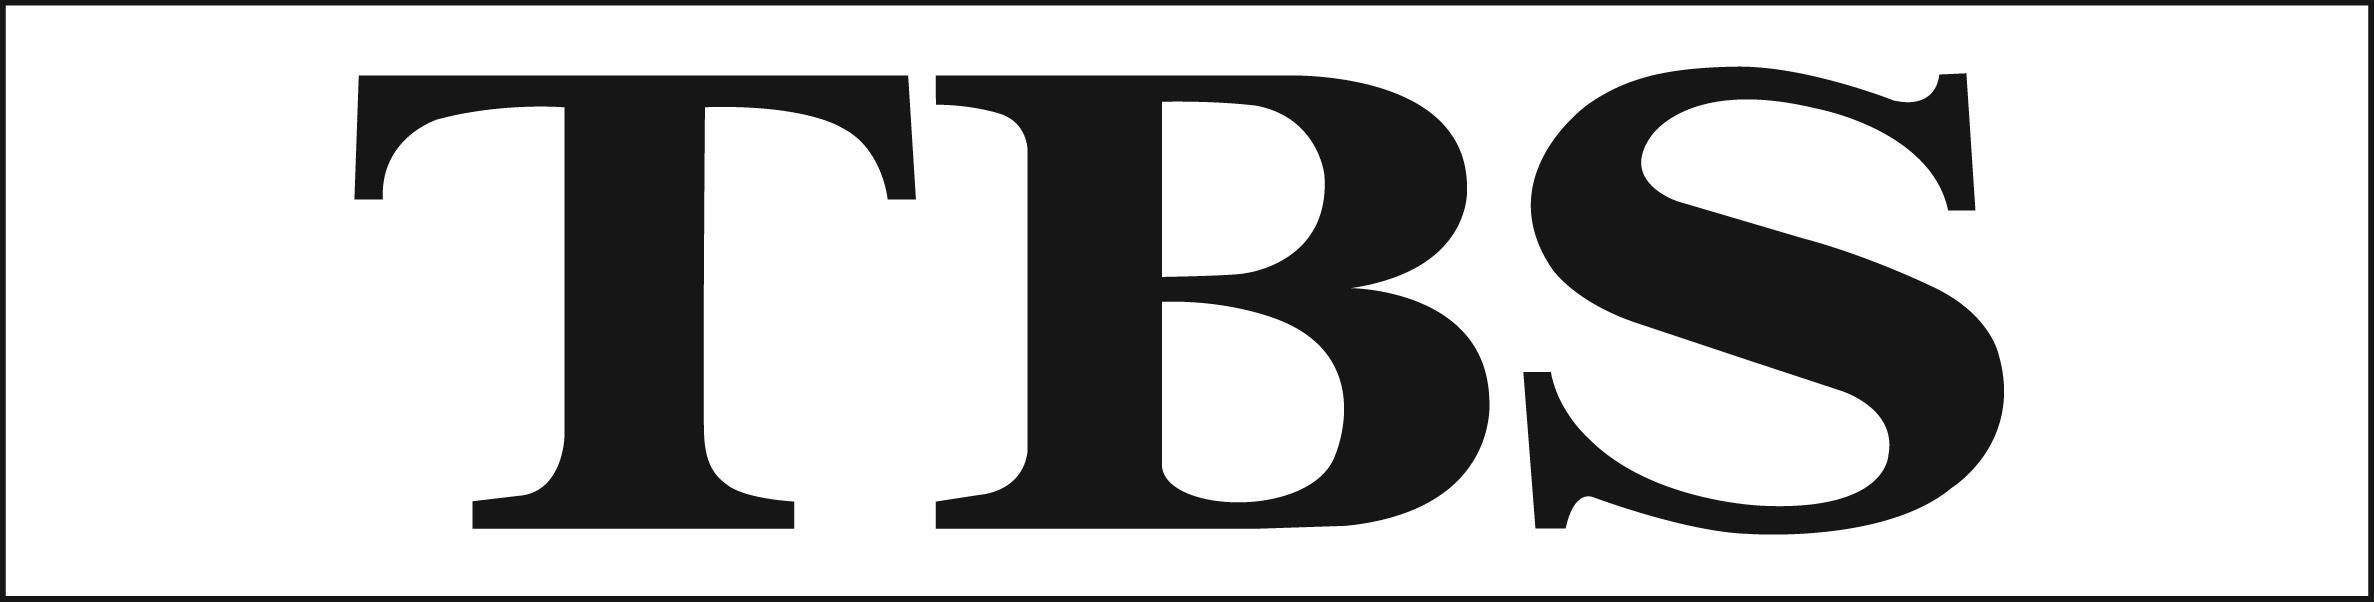 TBS - new logo ()